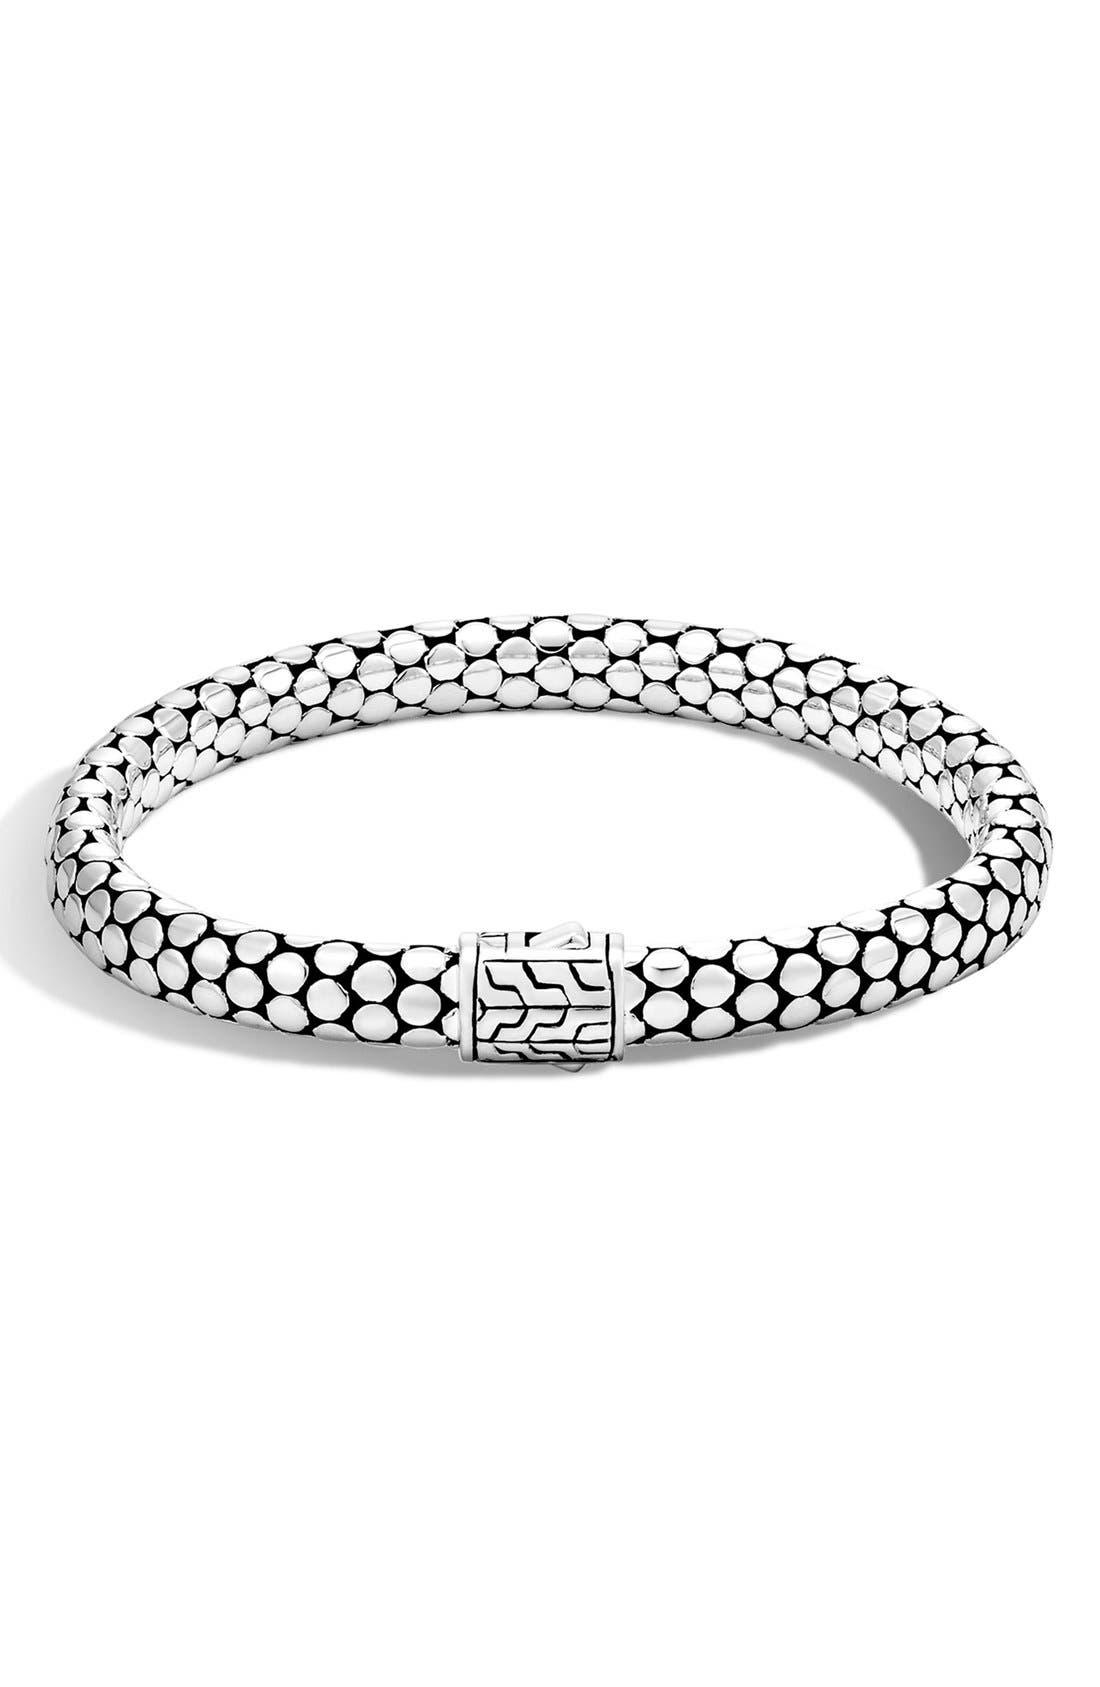 Main Image - John Hardy 'Dot' Small Chain Bracelet